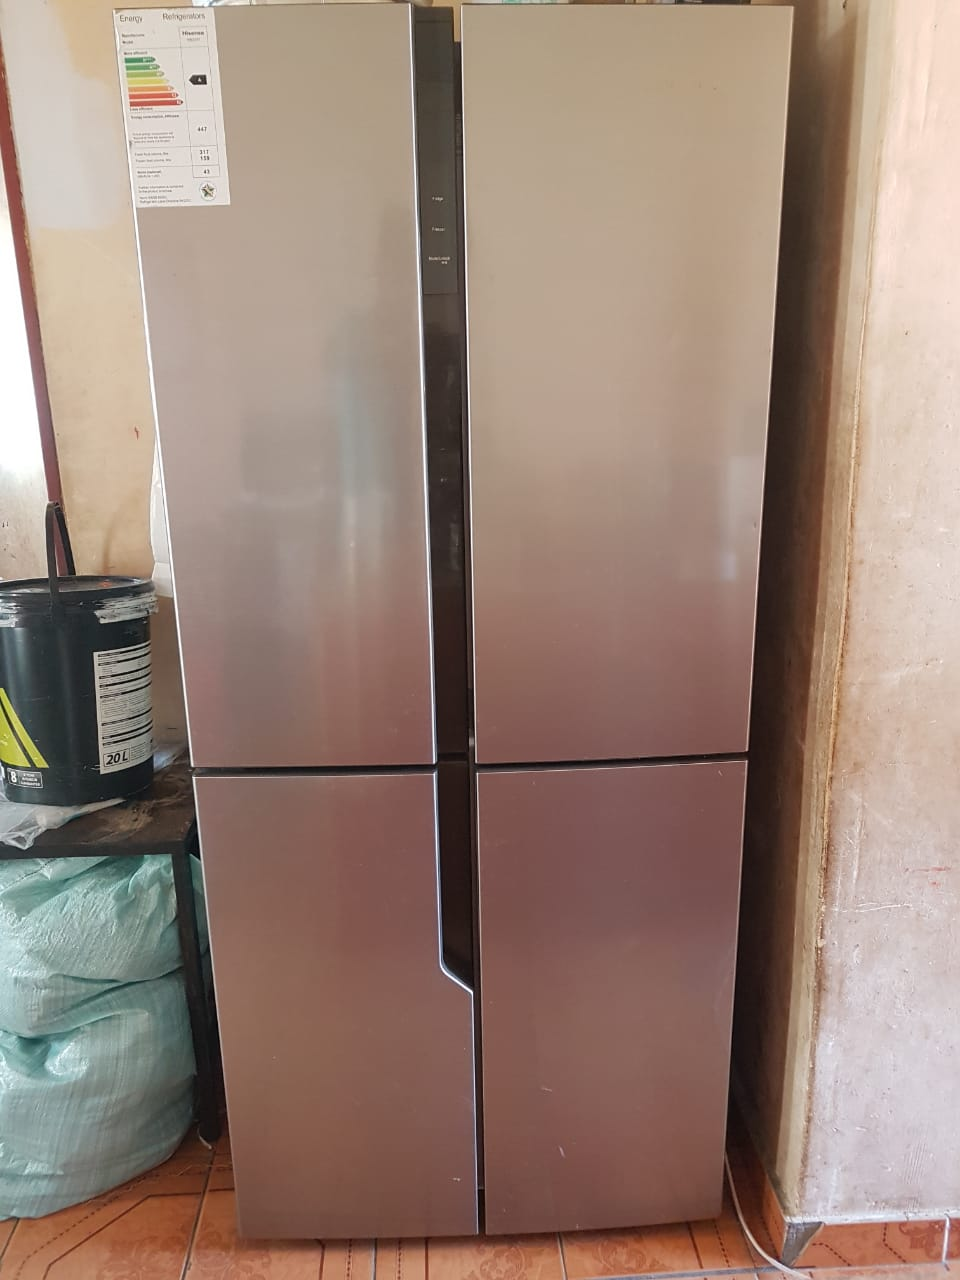 Metallic finish Hisense french door fridge